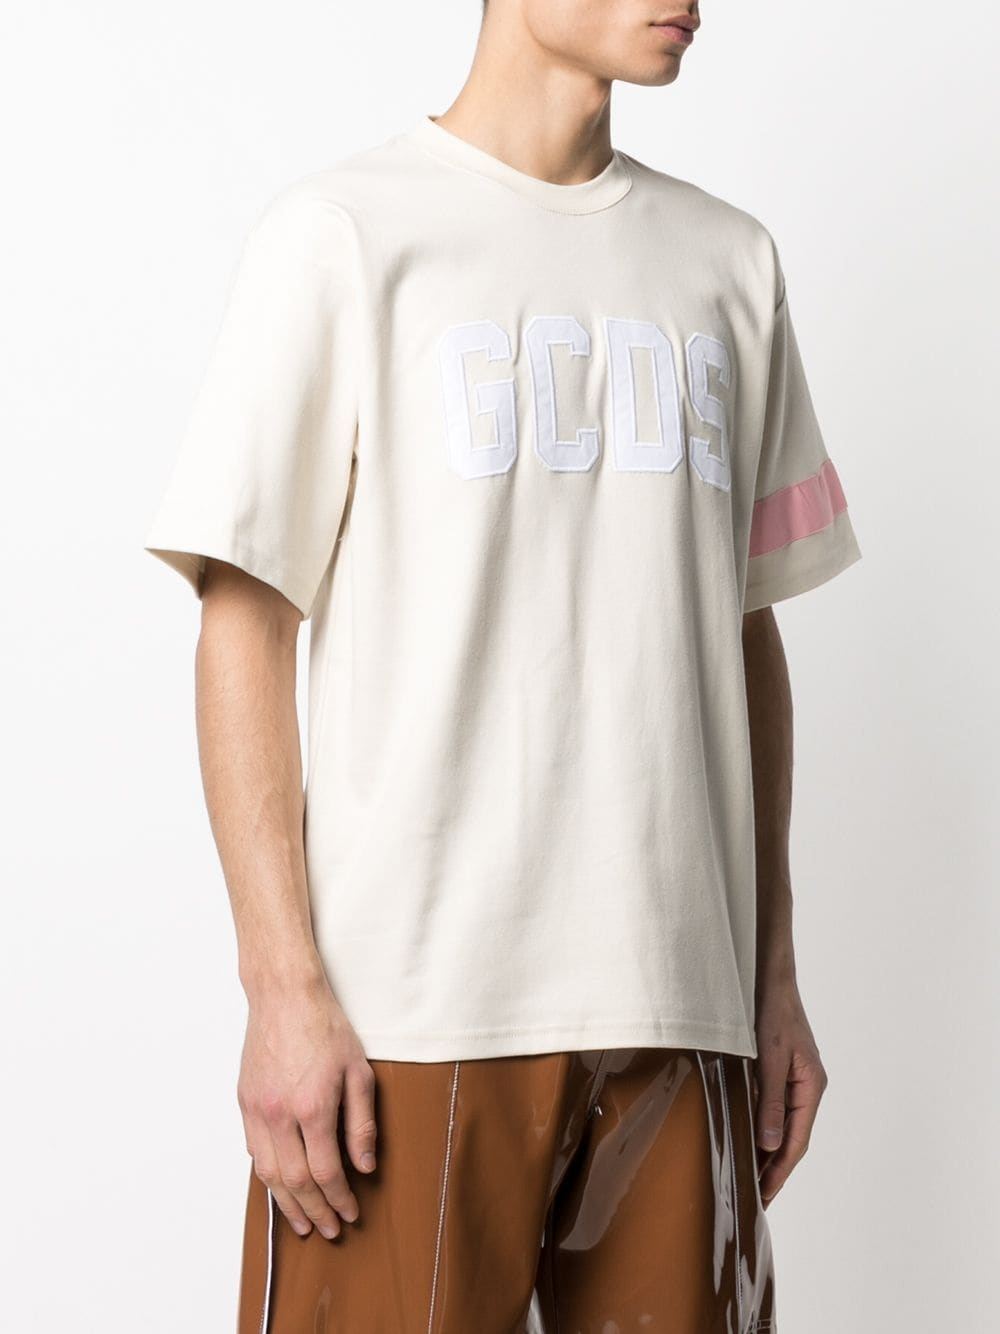 LOGO T-SHIRT GCDS | T-shirts | CC94M02100457